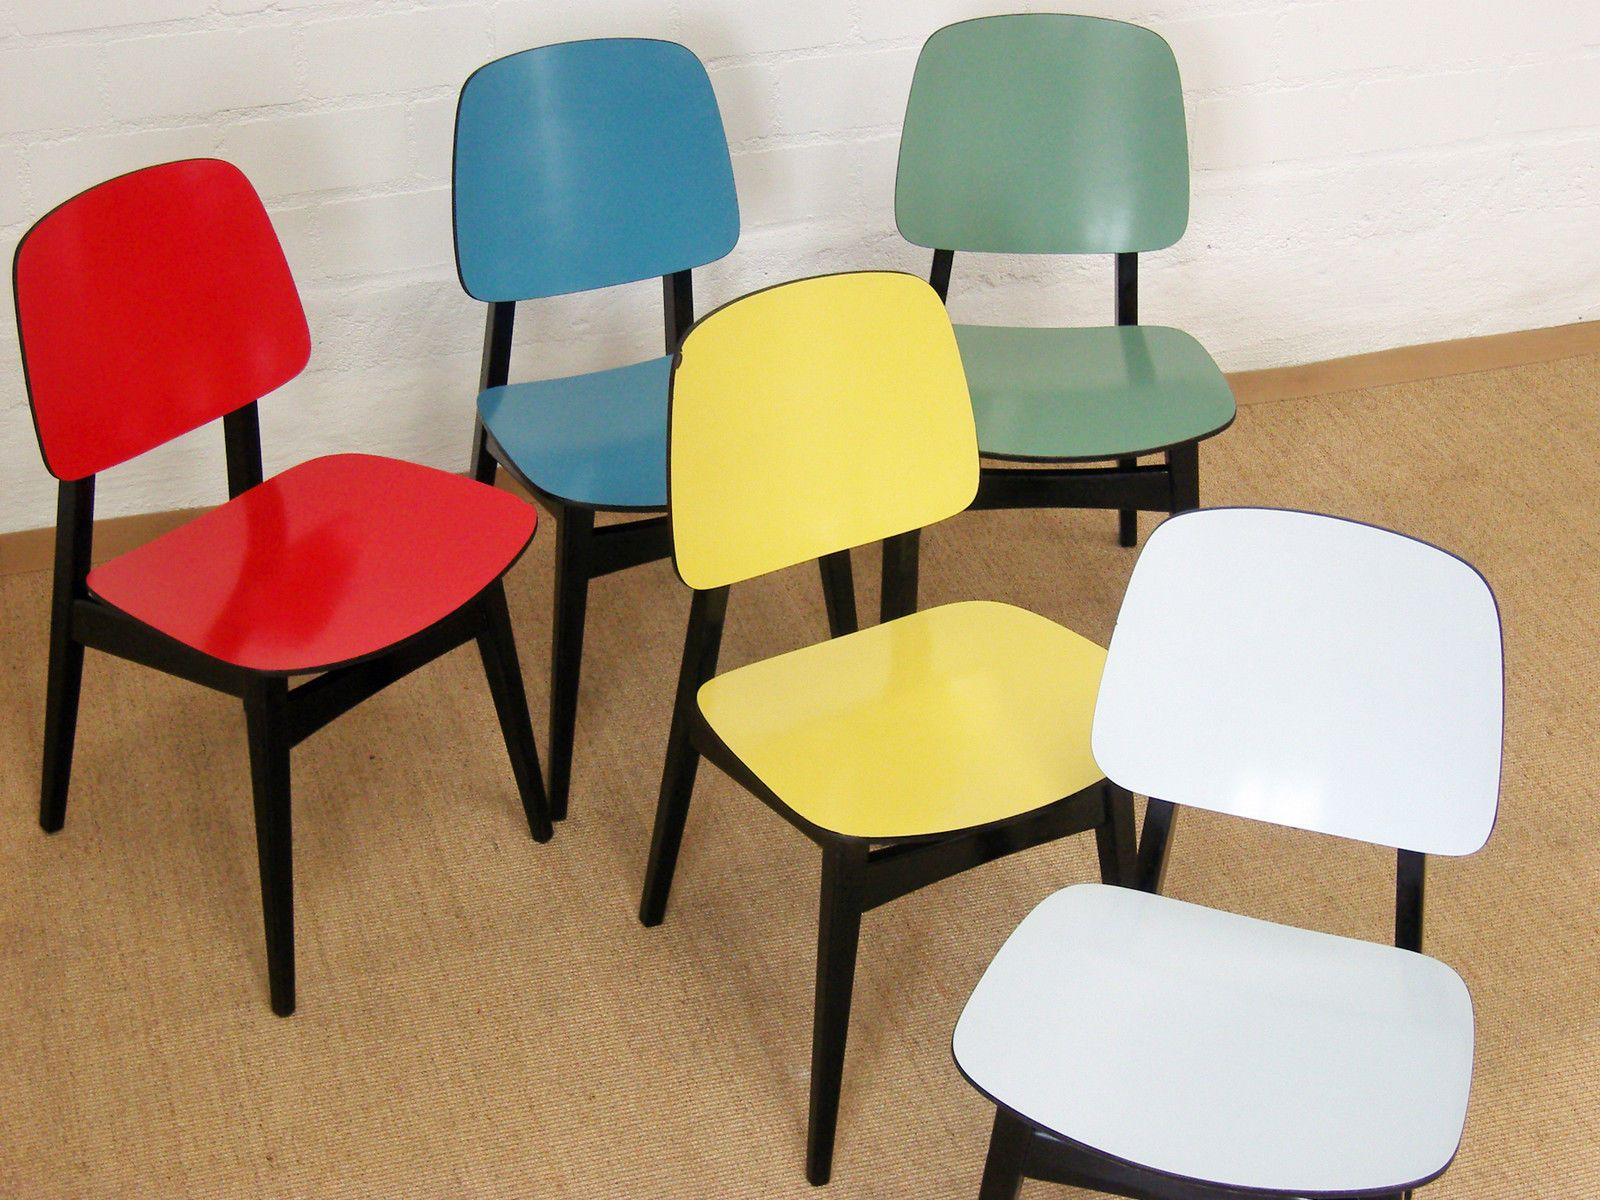 orig. LÜBKE Stuhl BLAU chair chaise 1 - 4 stühle dining chair 50er ...